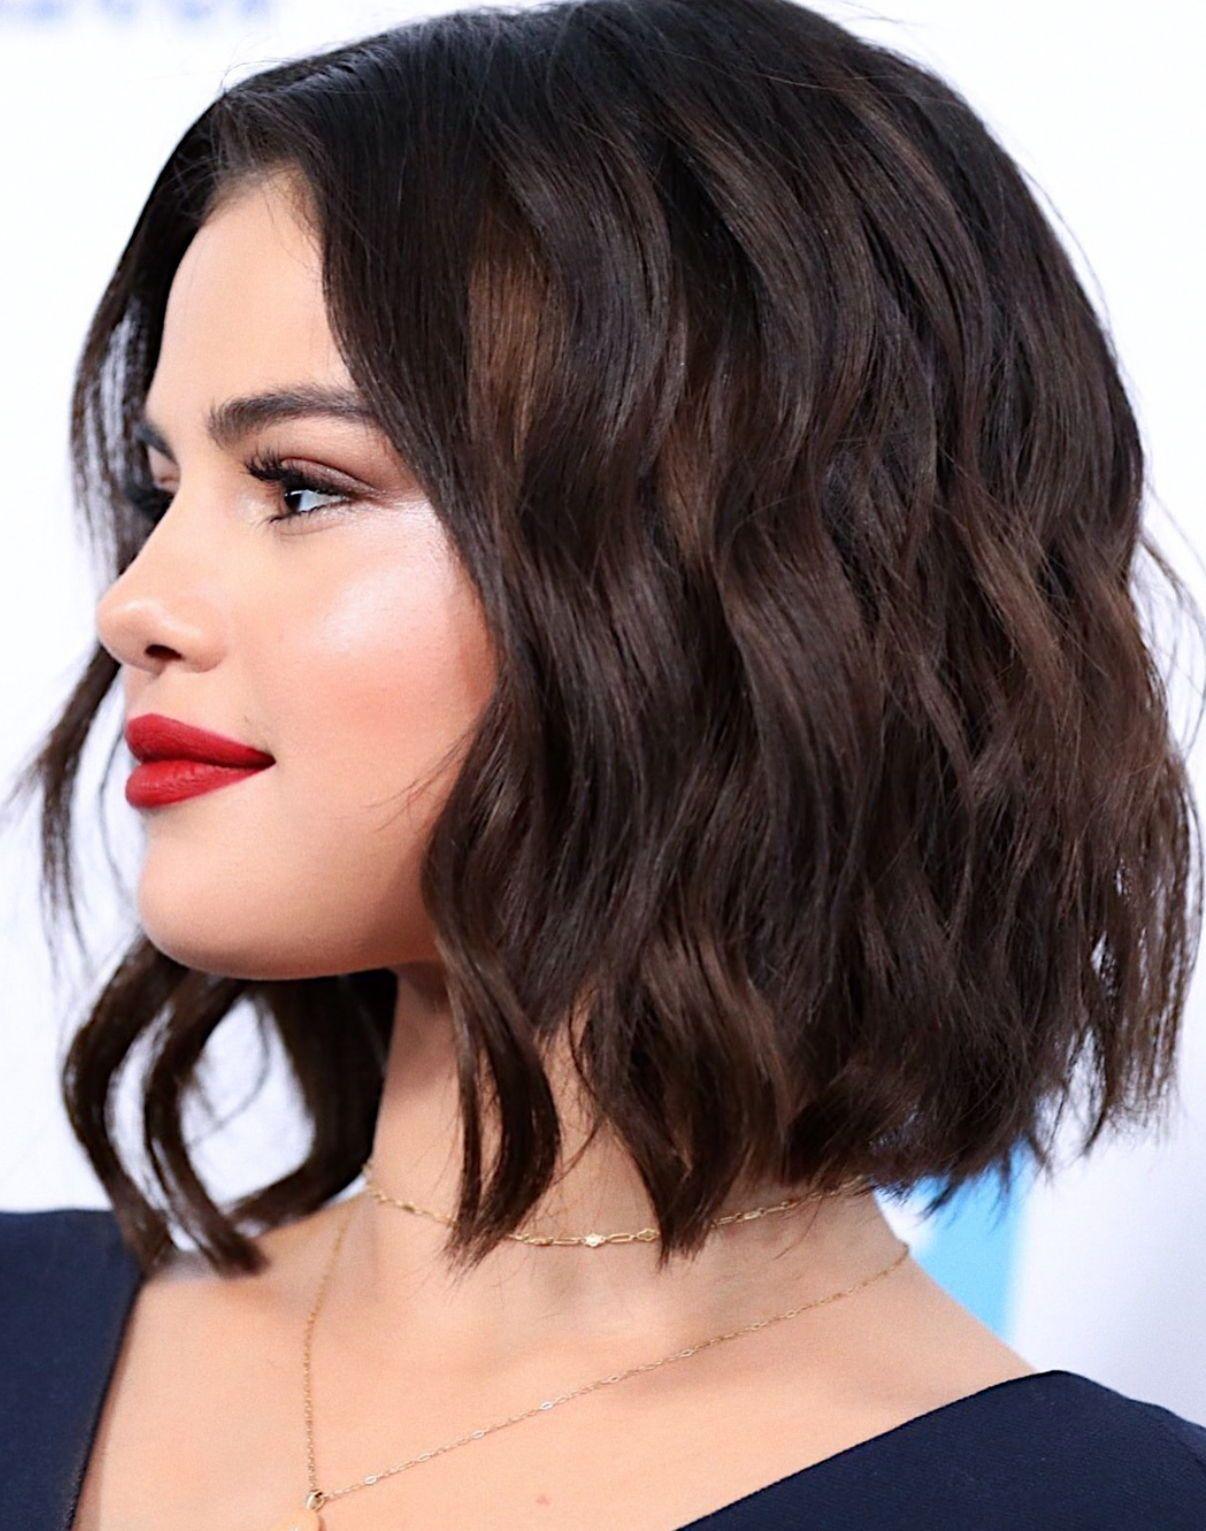 Selena Gomez Short Bob Hair Style And Curls Haircuts Selena Gomez Hair Wavy Bob Hairstyles Thick Hair Styles